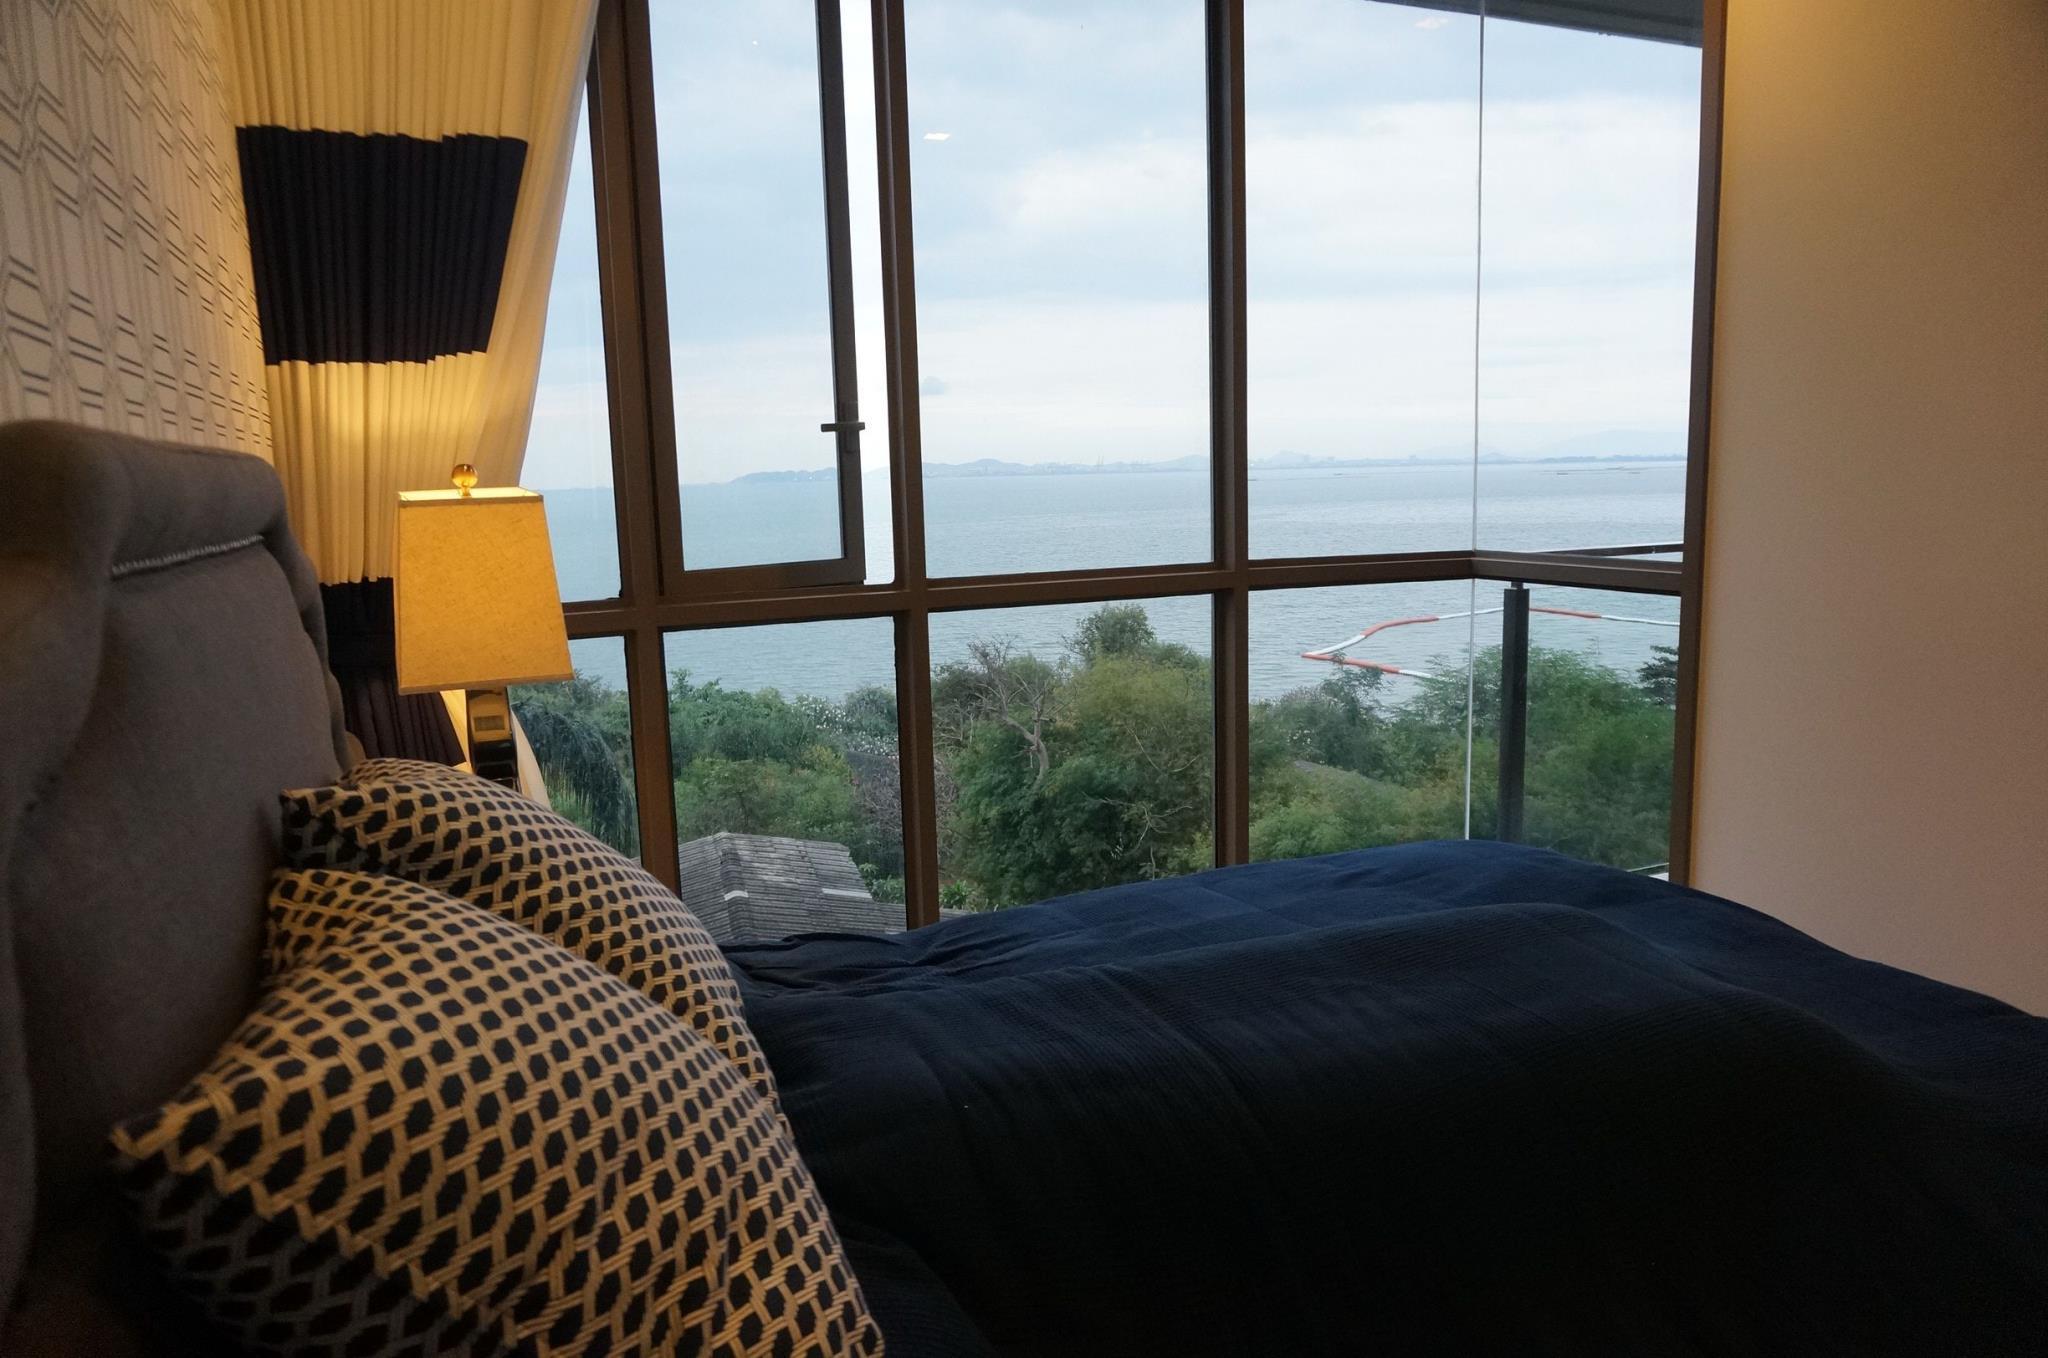 Baan Plai Haad Beachfront Condominium